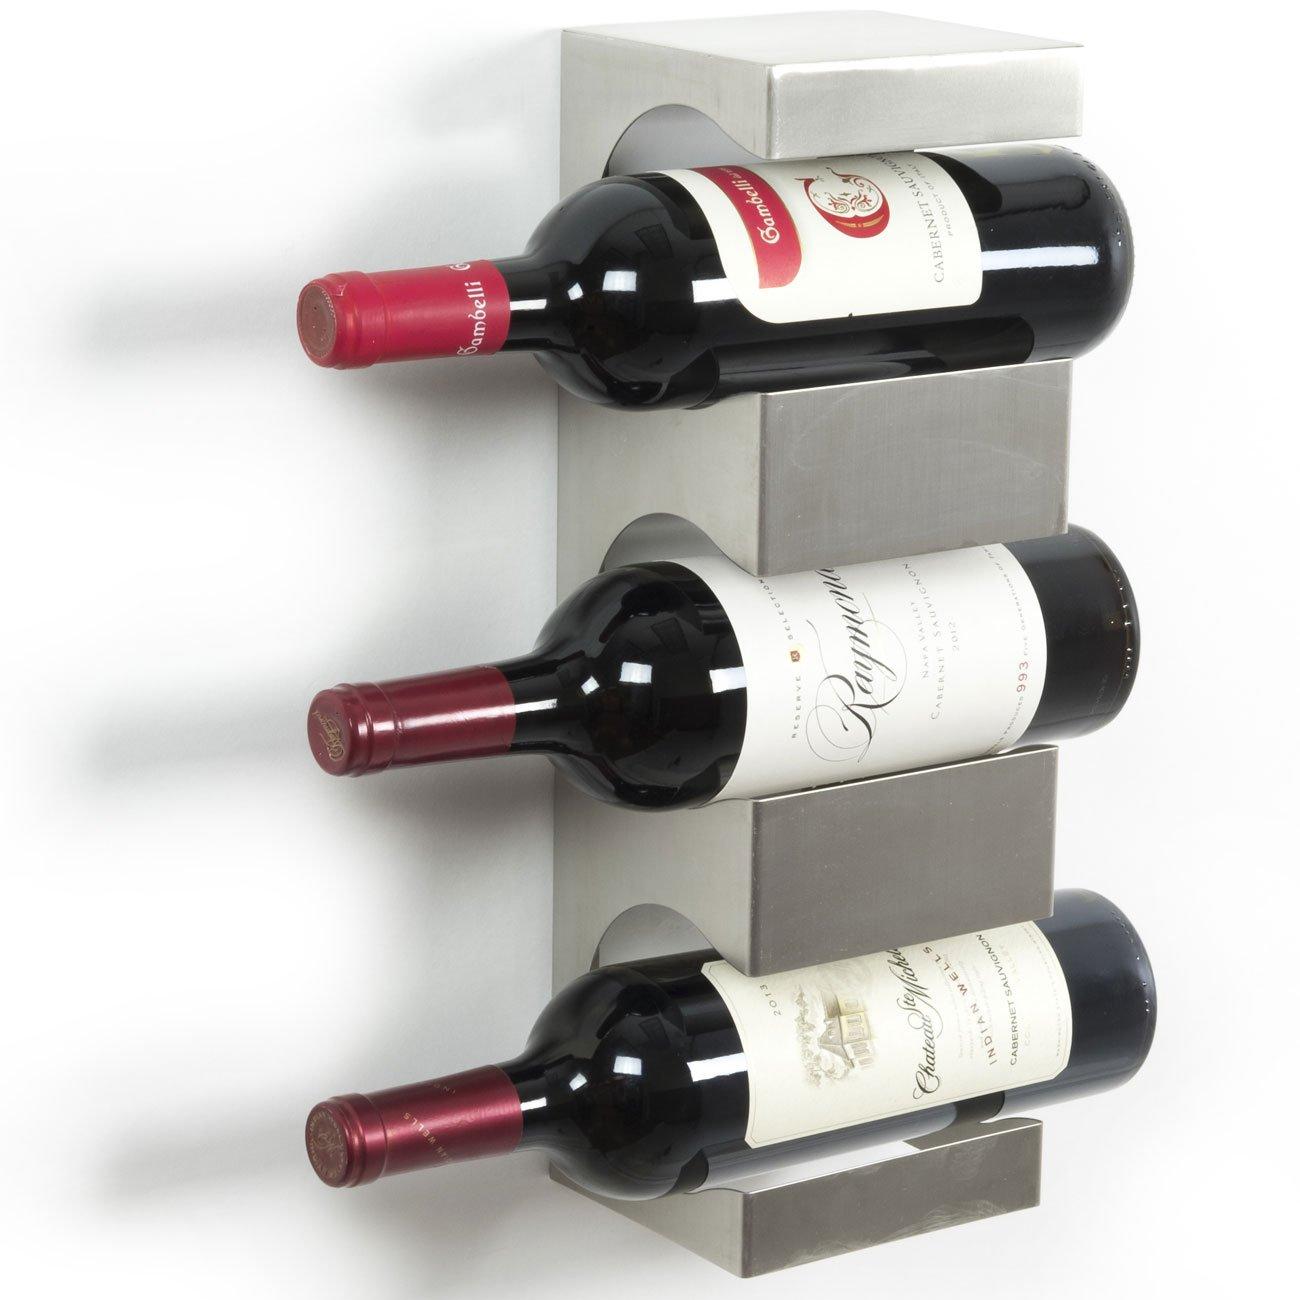 Stainless Steel Wine Rack - Wide Multi Sectional Bottle Holder with Top Shelf Section - Modern Art Design - Wall Mount (3 Bottles)